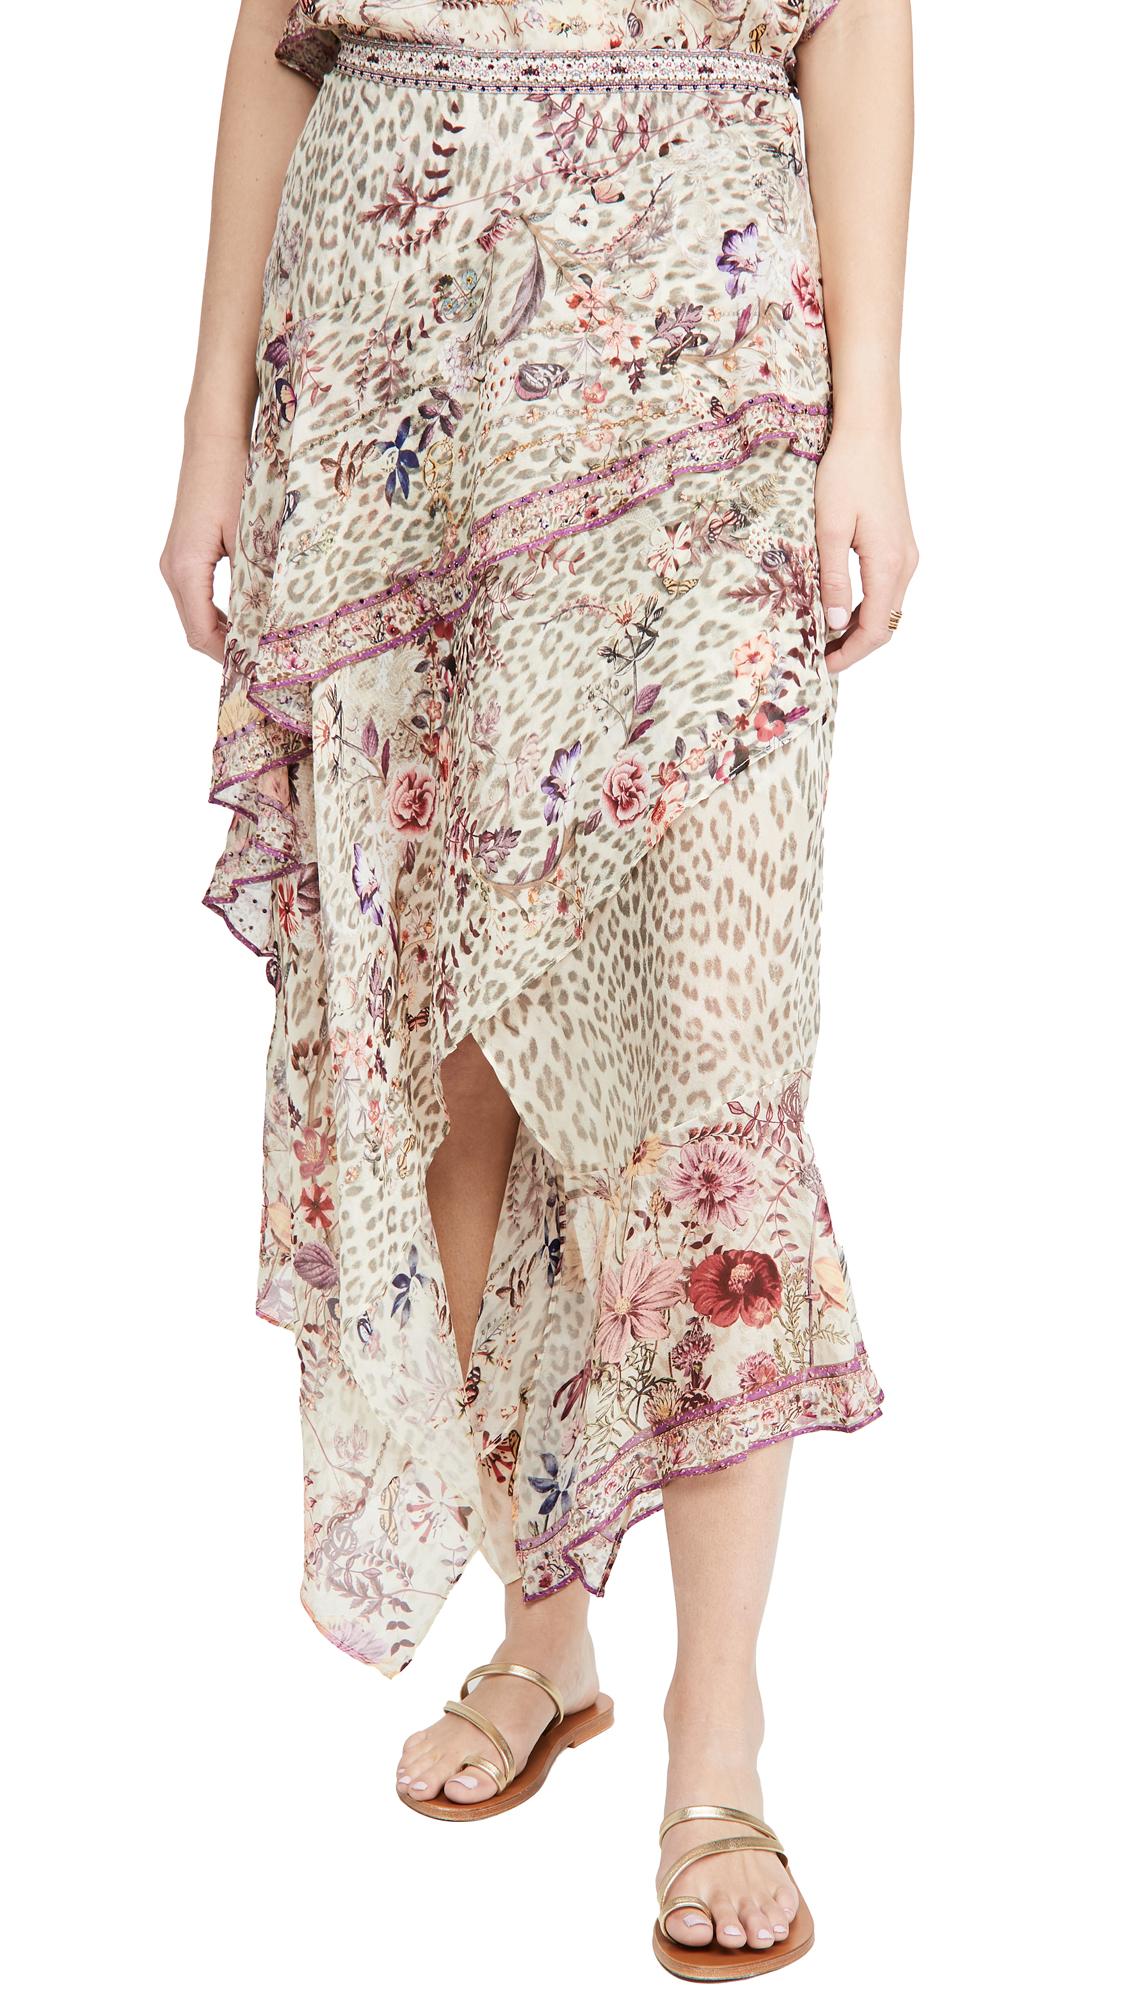 Camilla Asymmetrical Ruffle Skirt